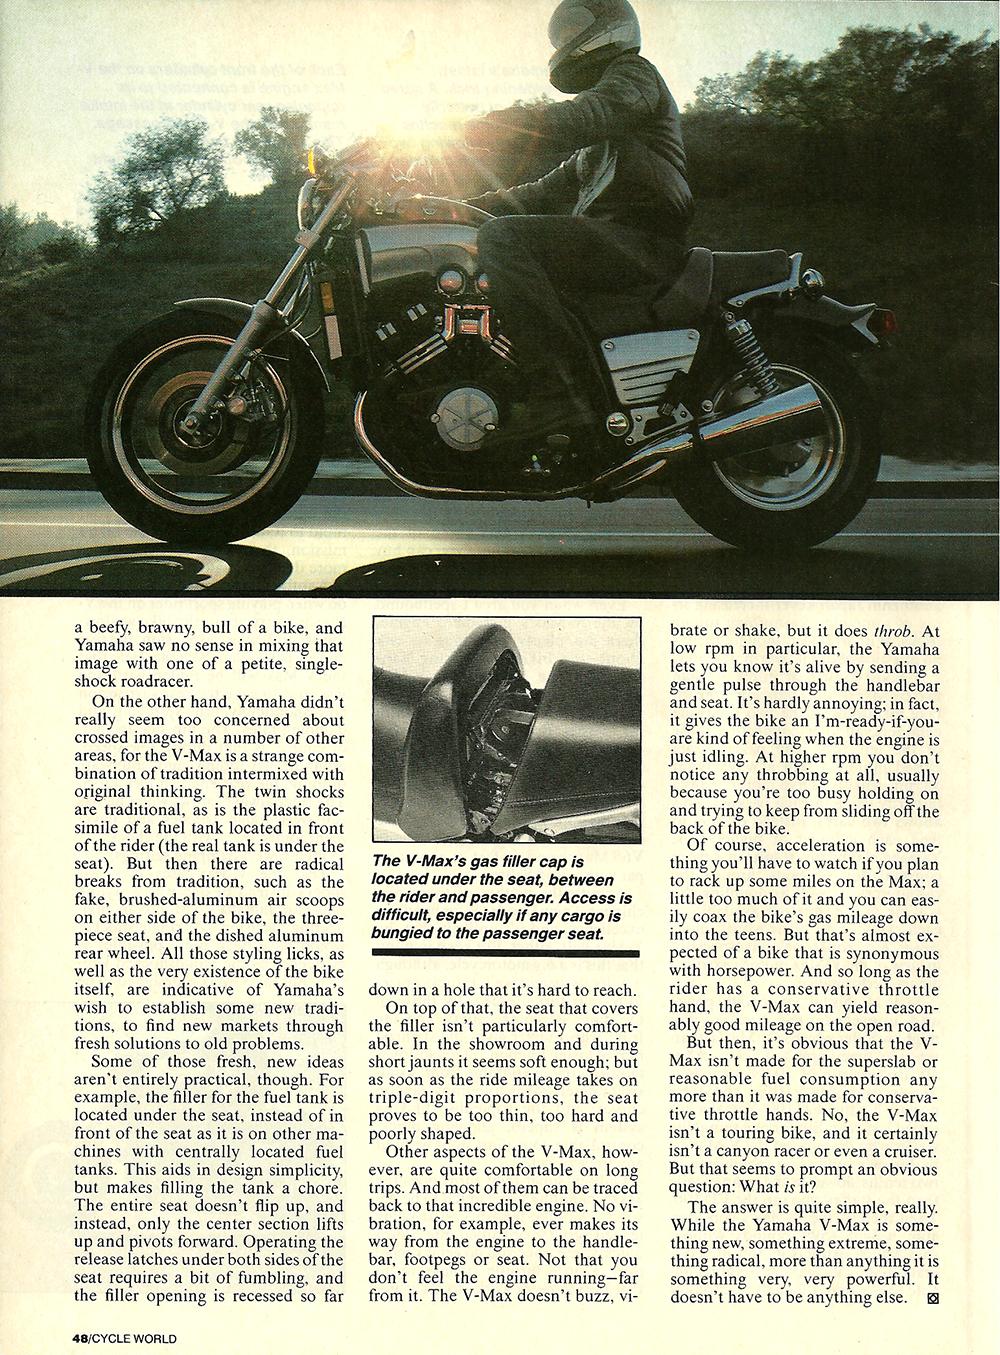 1985 Yamama Vmax 1200 road test 05.jpg